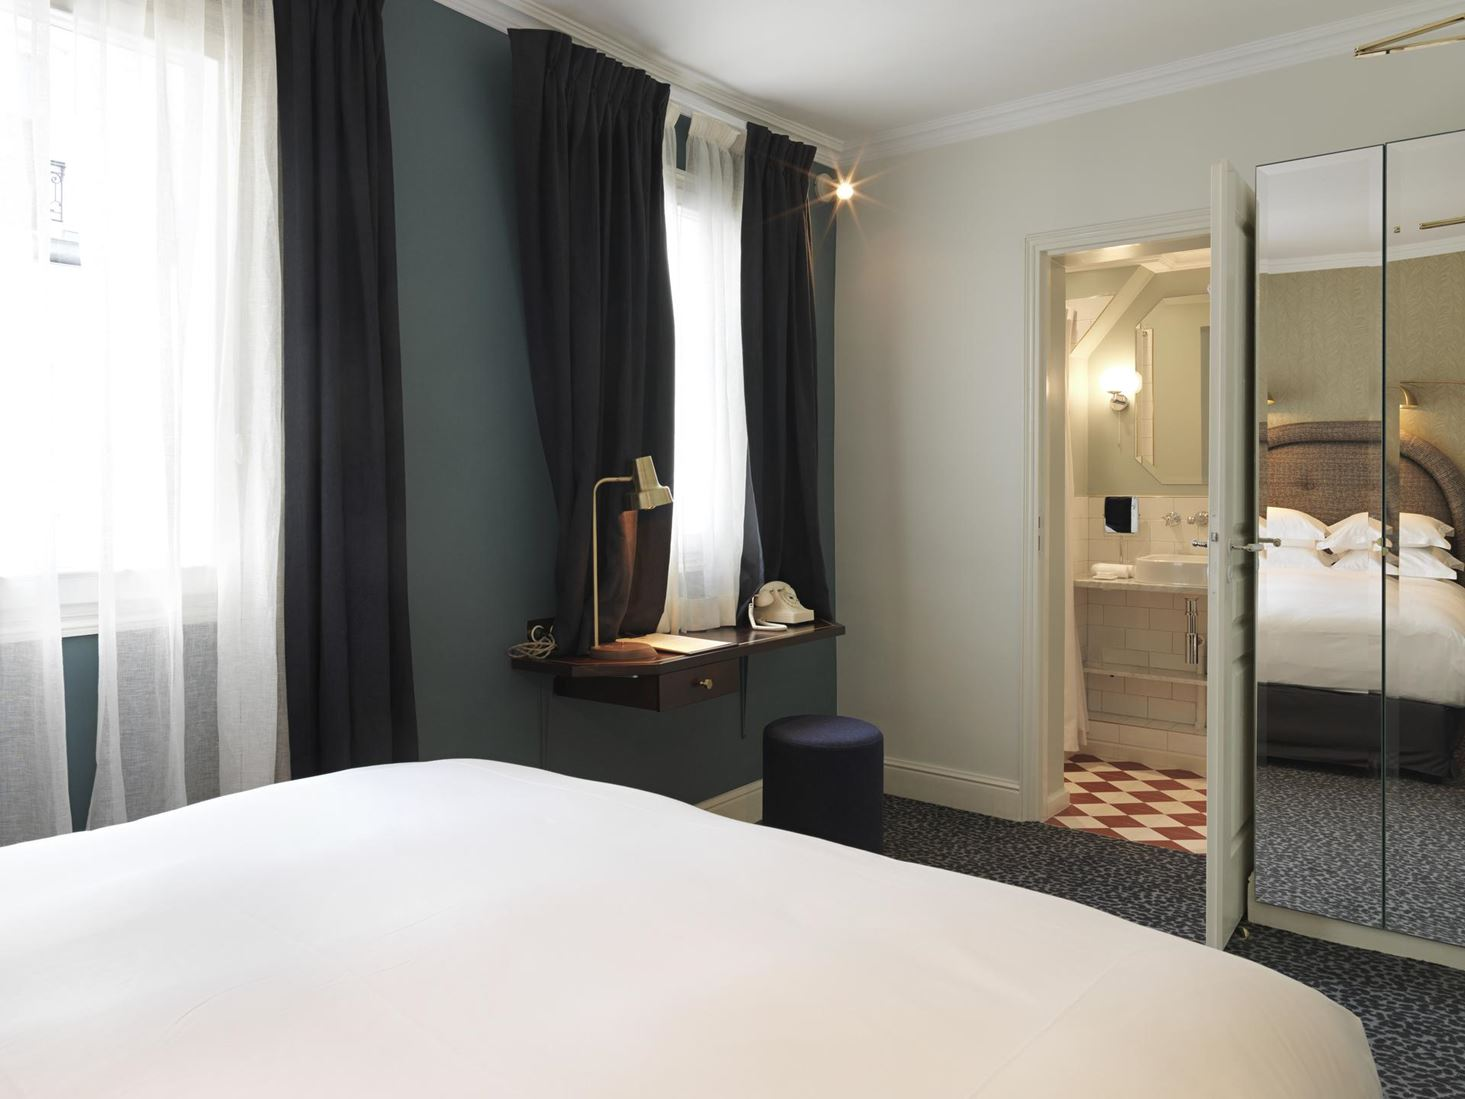 camera da letto - Mansarda.it